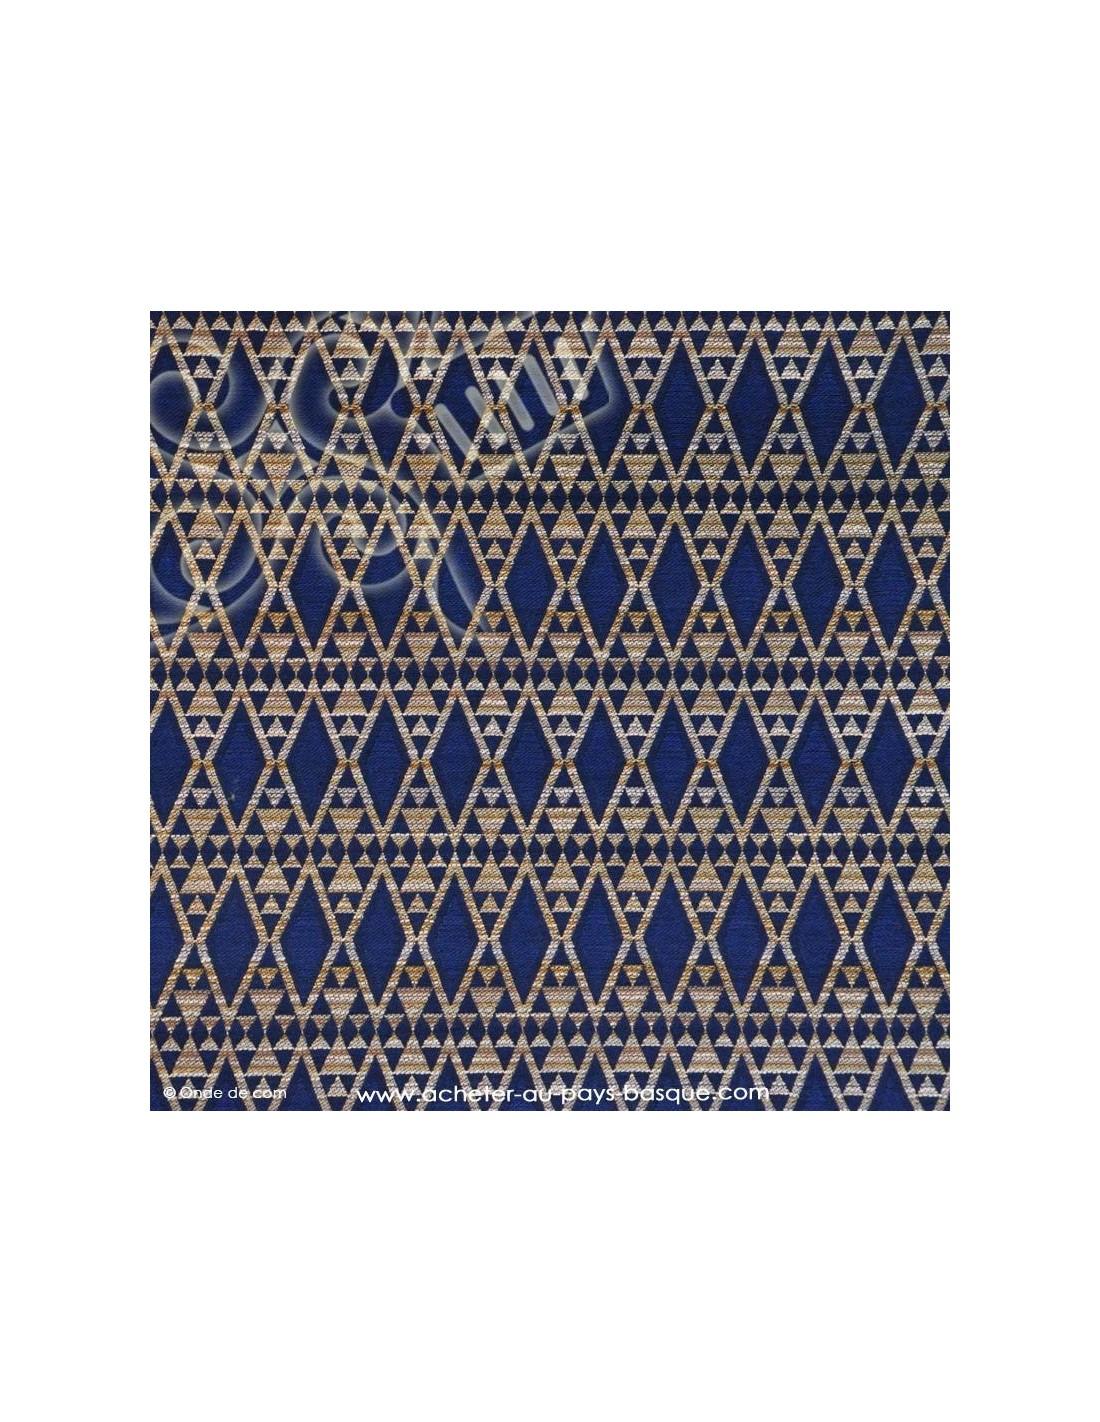 tissu brocard bleu tissu ameublement docks negresse biarritz. Black Bedroom Furniture Sets. Home Design Ideas